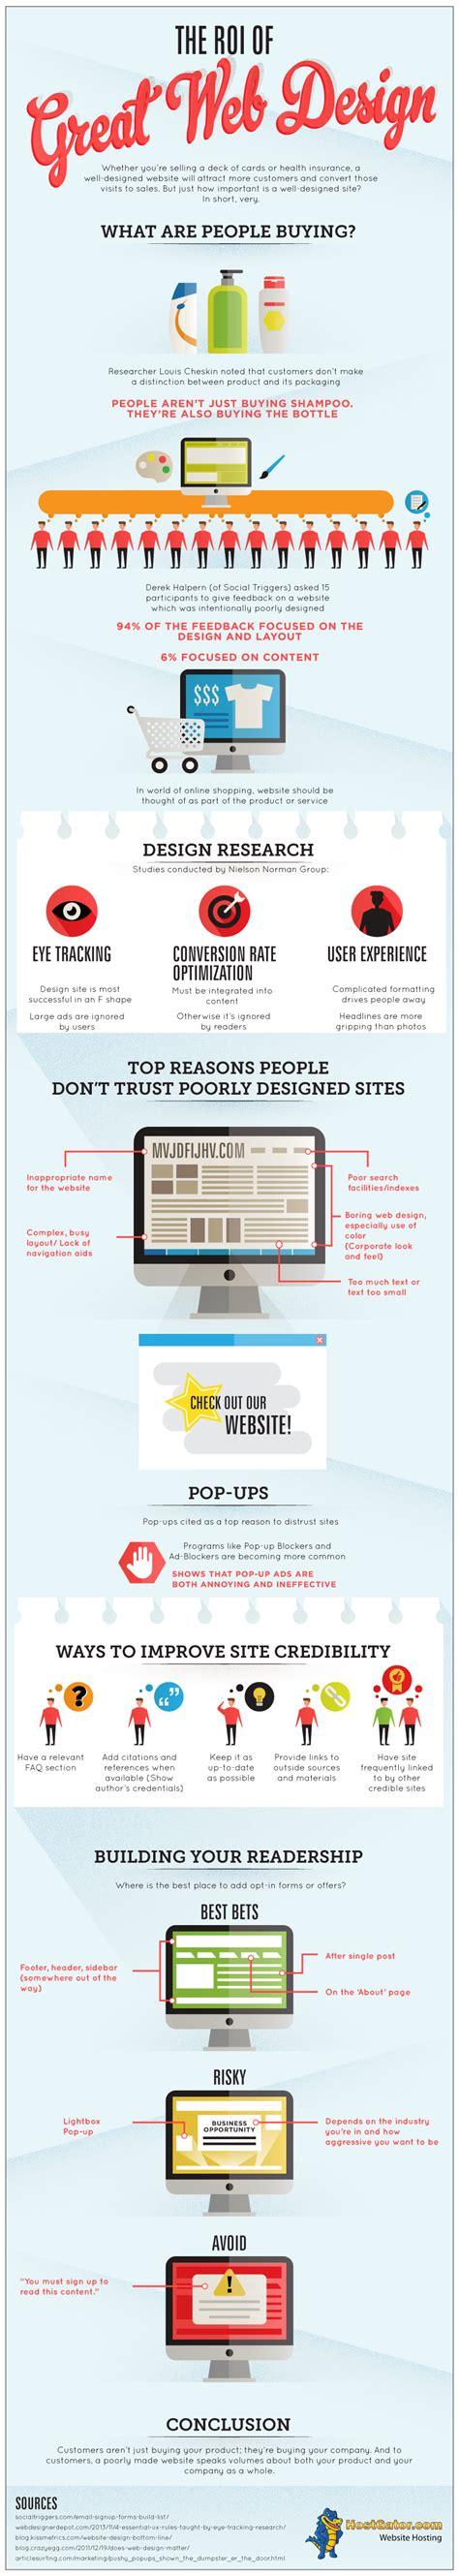 infographic the roi of great web design hostgator gator crossing